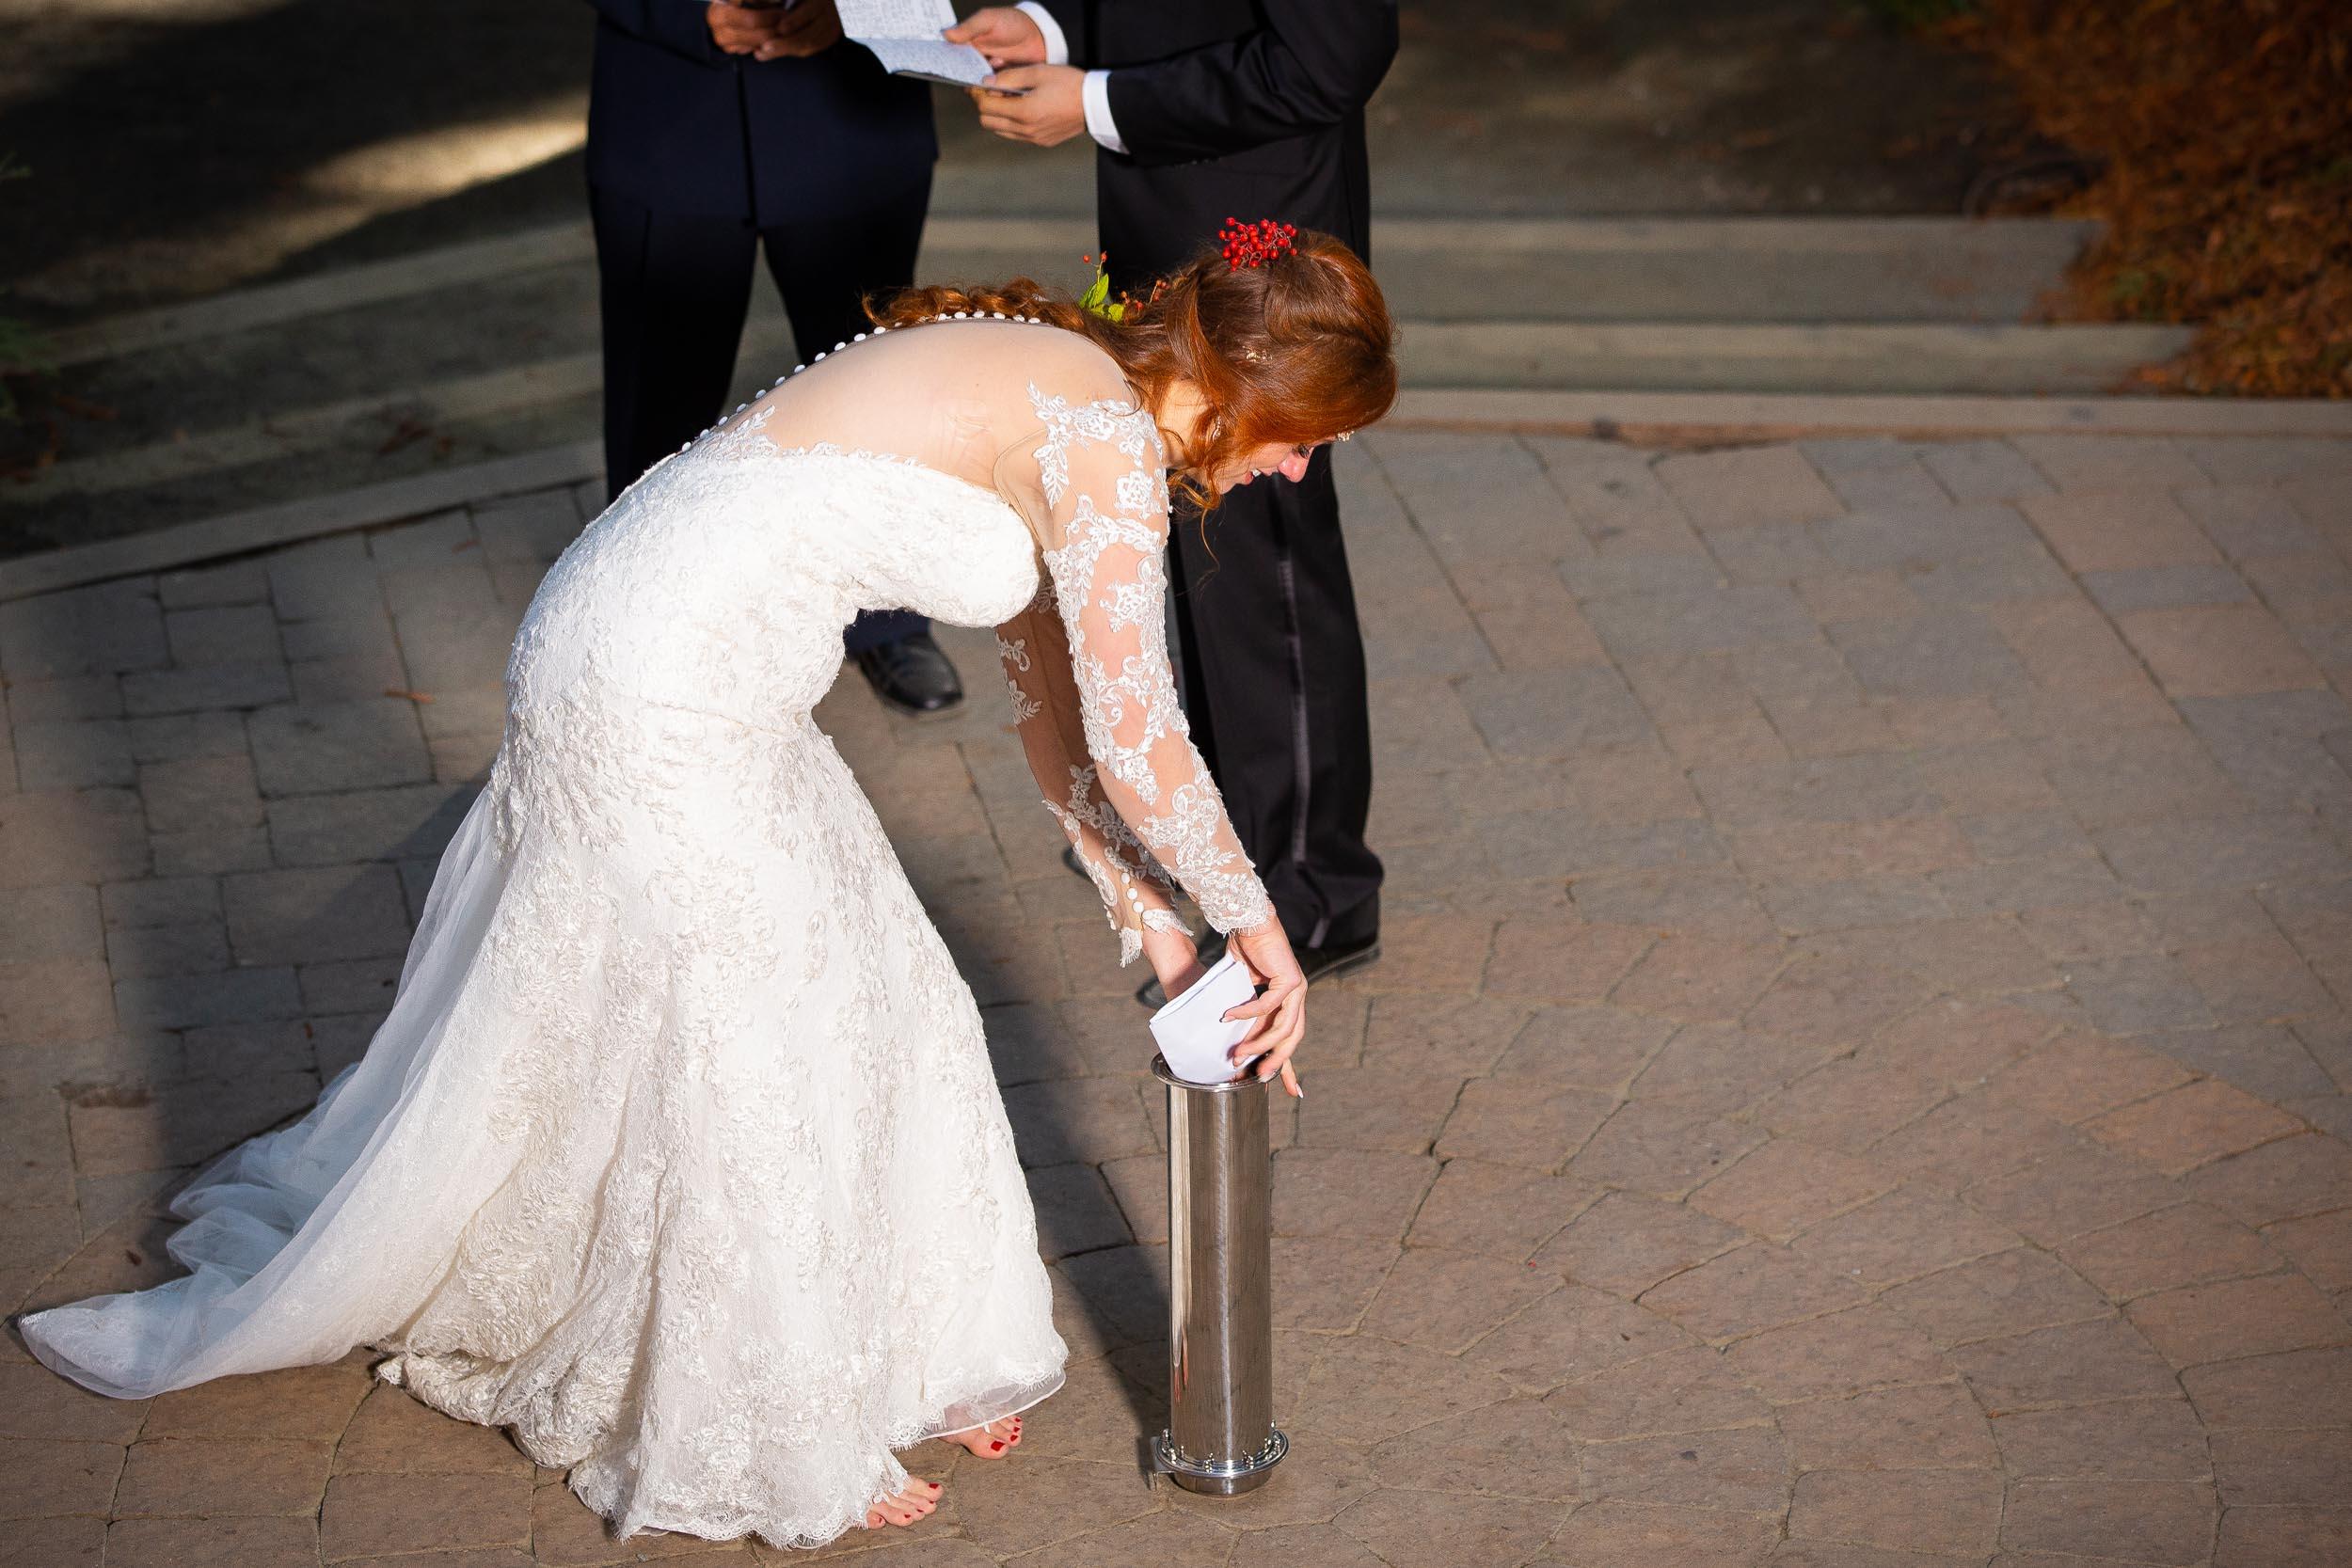 Berkeley Botanical Garden Wedding Ceremony in the Redwood Grove Ceremony and SF Bay Wedding Cruise Reception-39.jpg